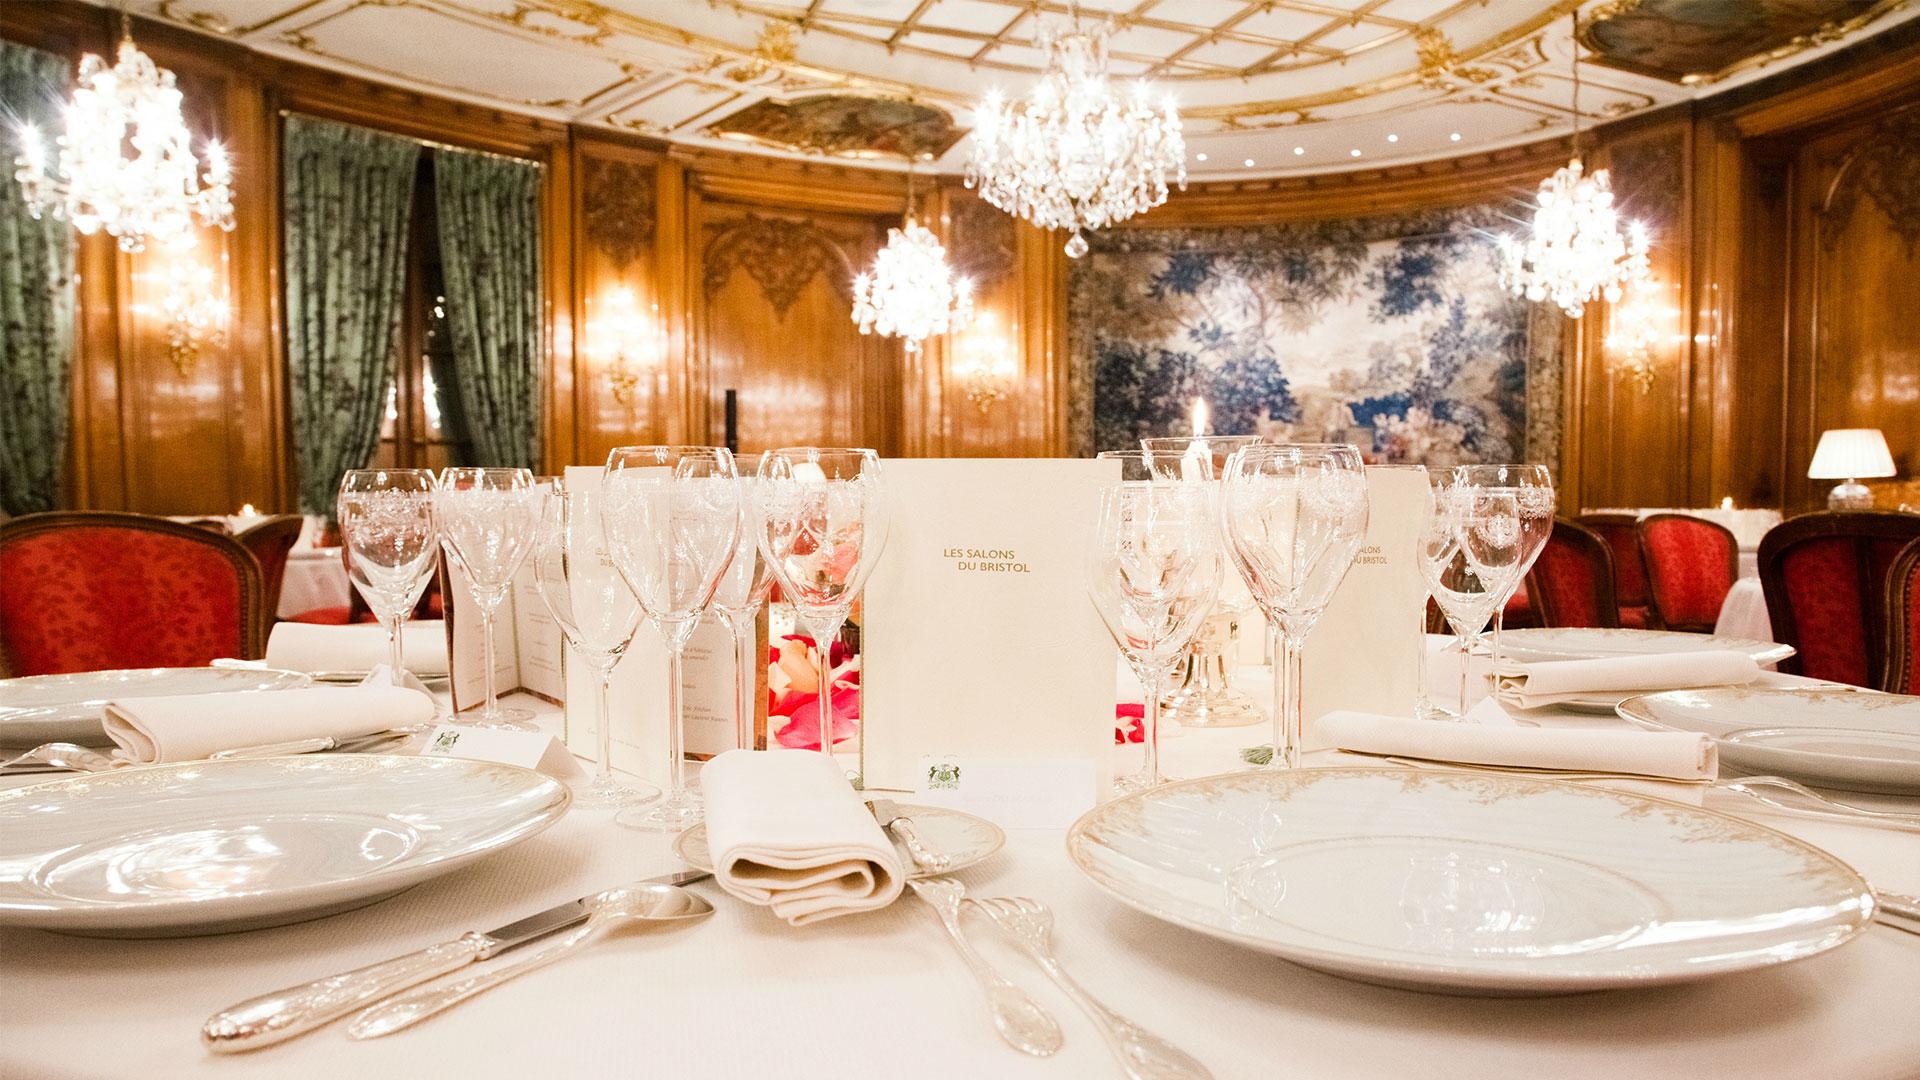 Luxury Wedding Venue in Paris | Le Bristol Paris